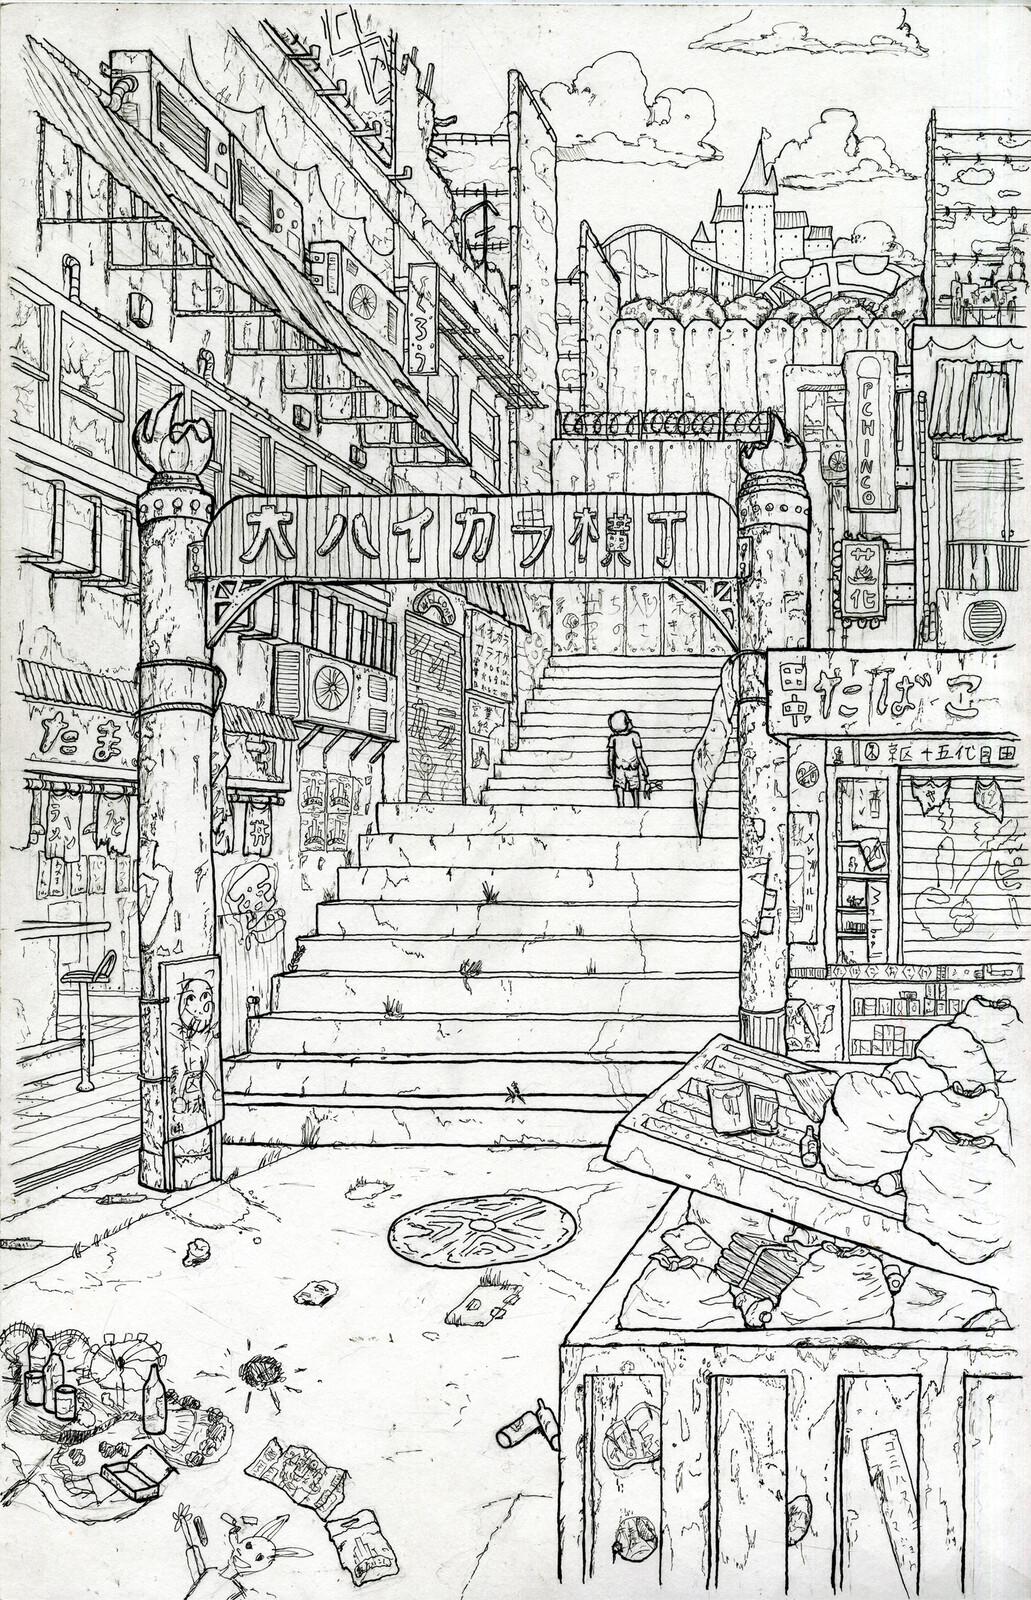 The slam street